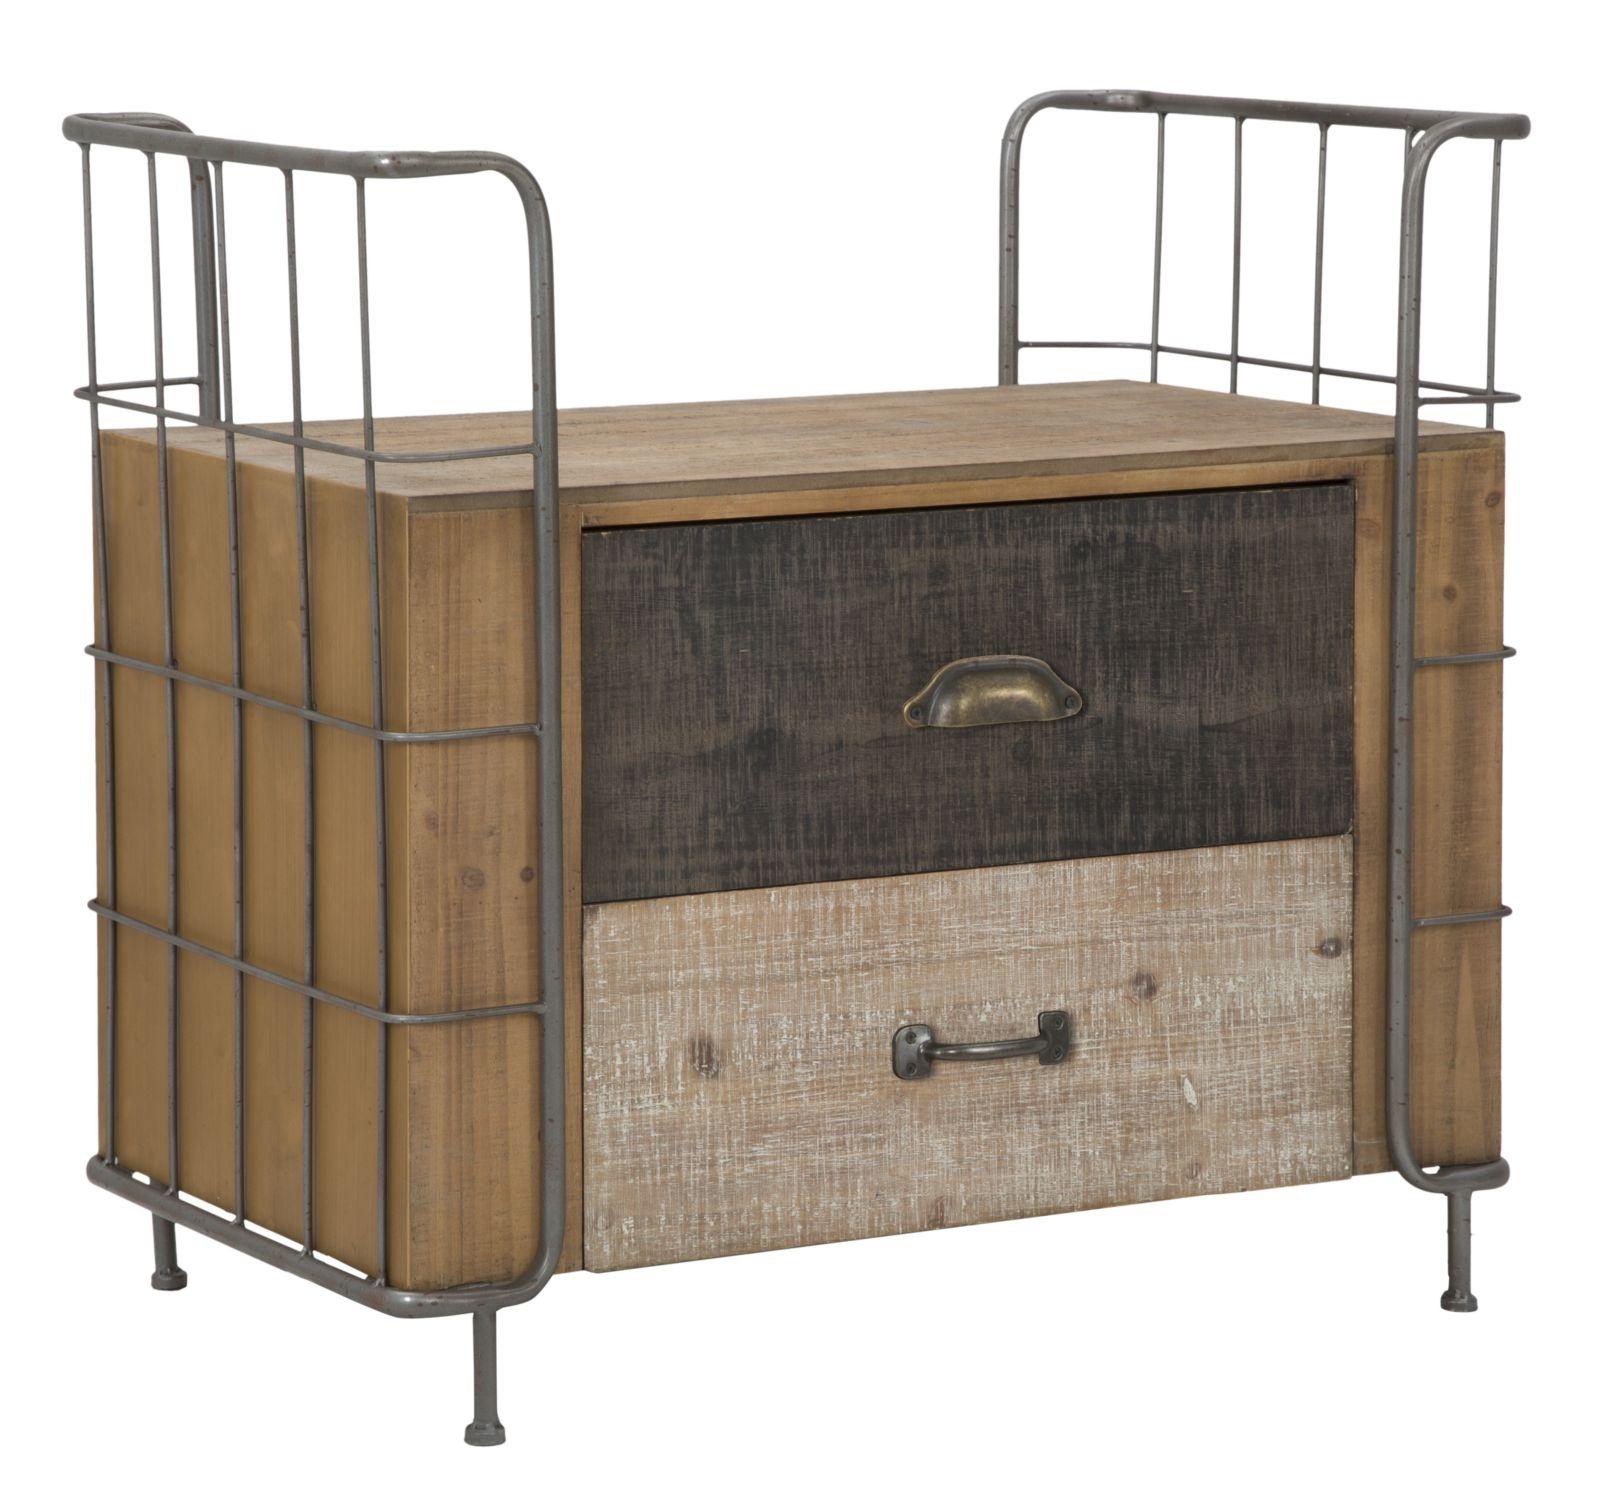 Noptiera din lemn si metal, cu 2 sertare Express Natural, l71,5xA43,5xH67 cm somproduct.ro